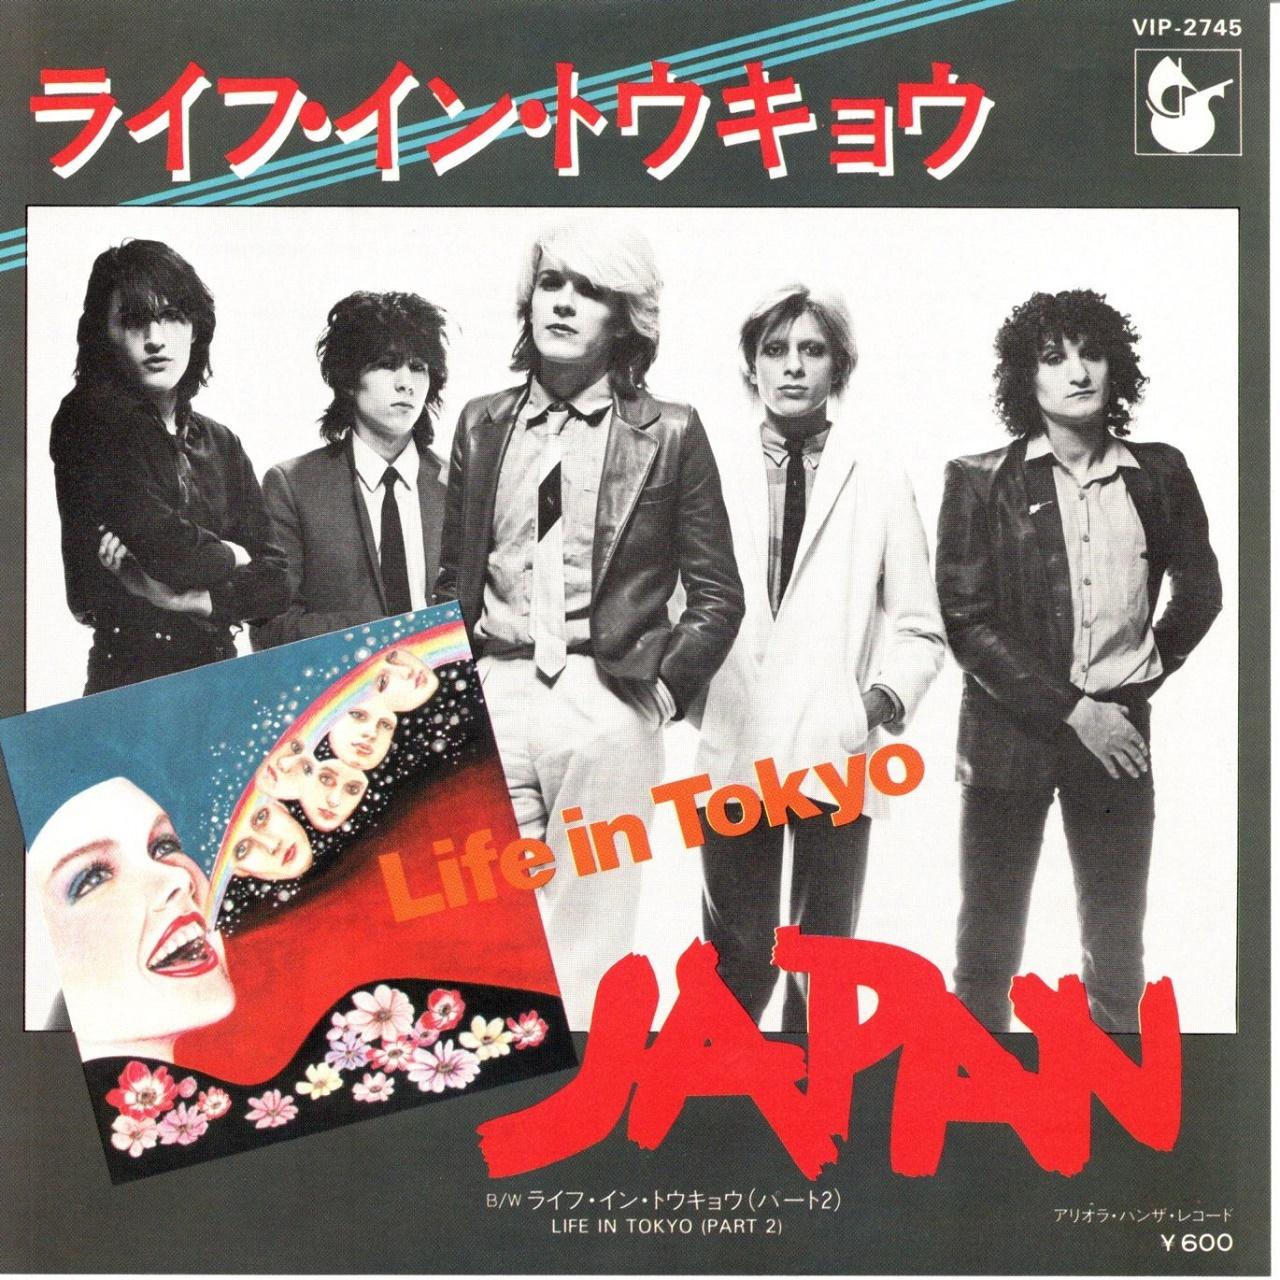 【7inch・国内盤】ジャパン / ライフ・イン・トウキョウ